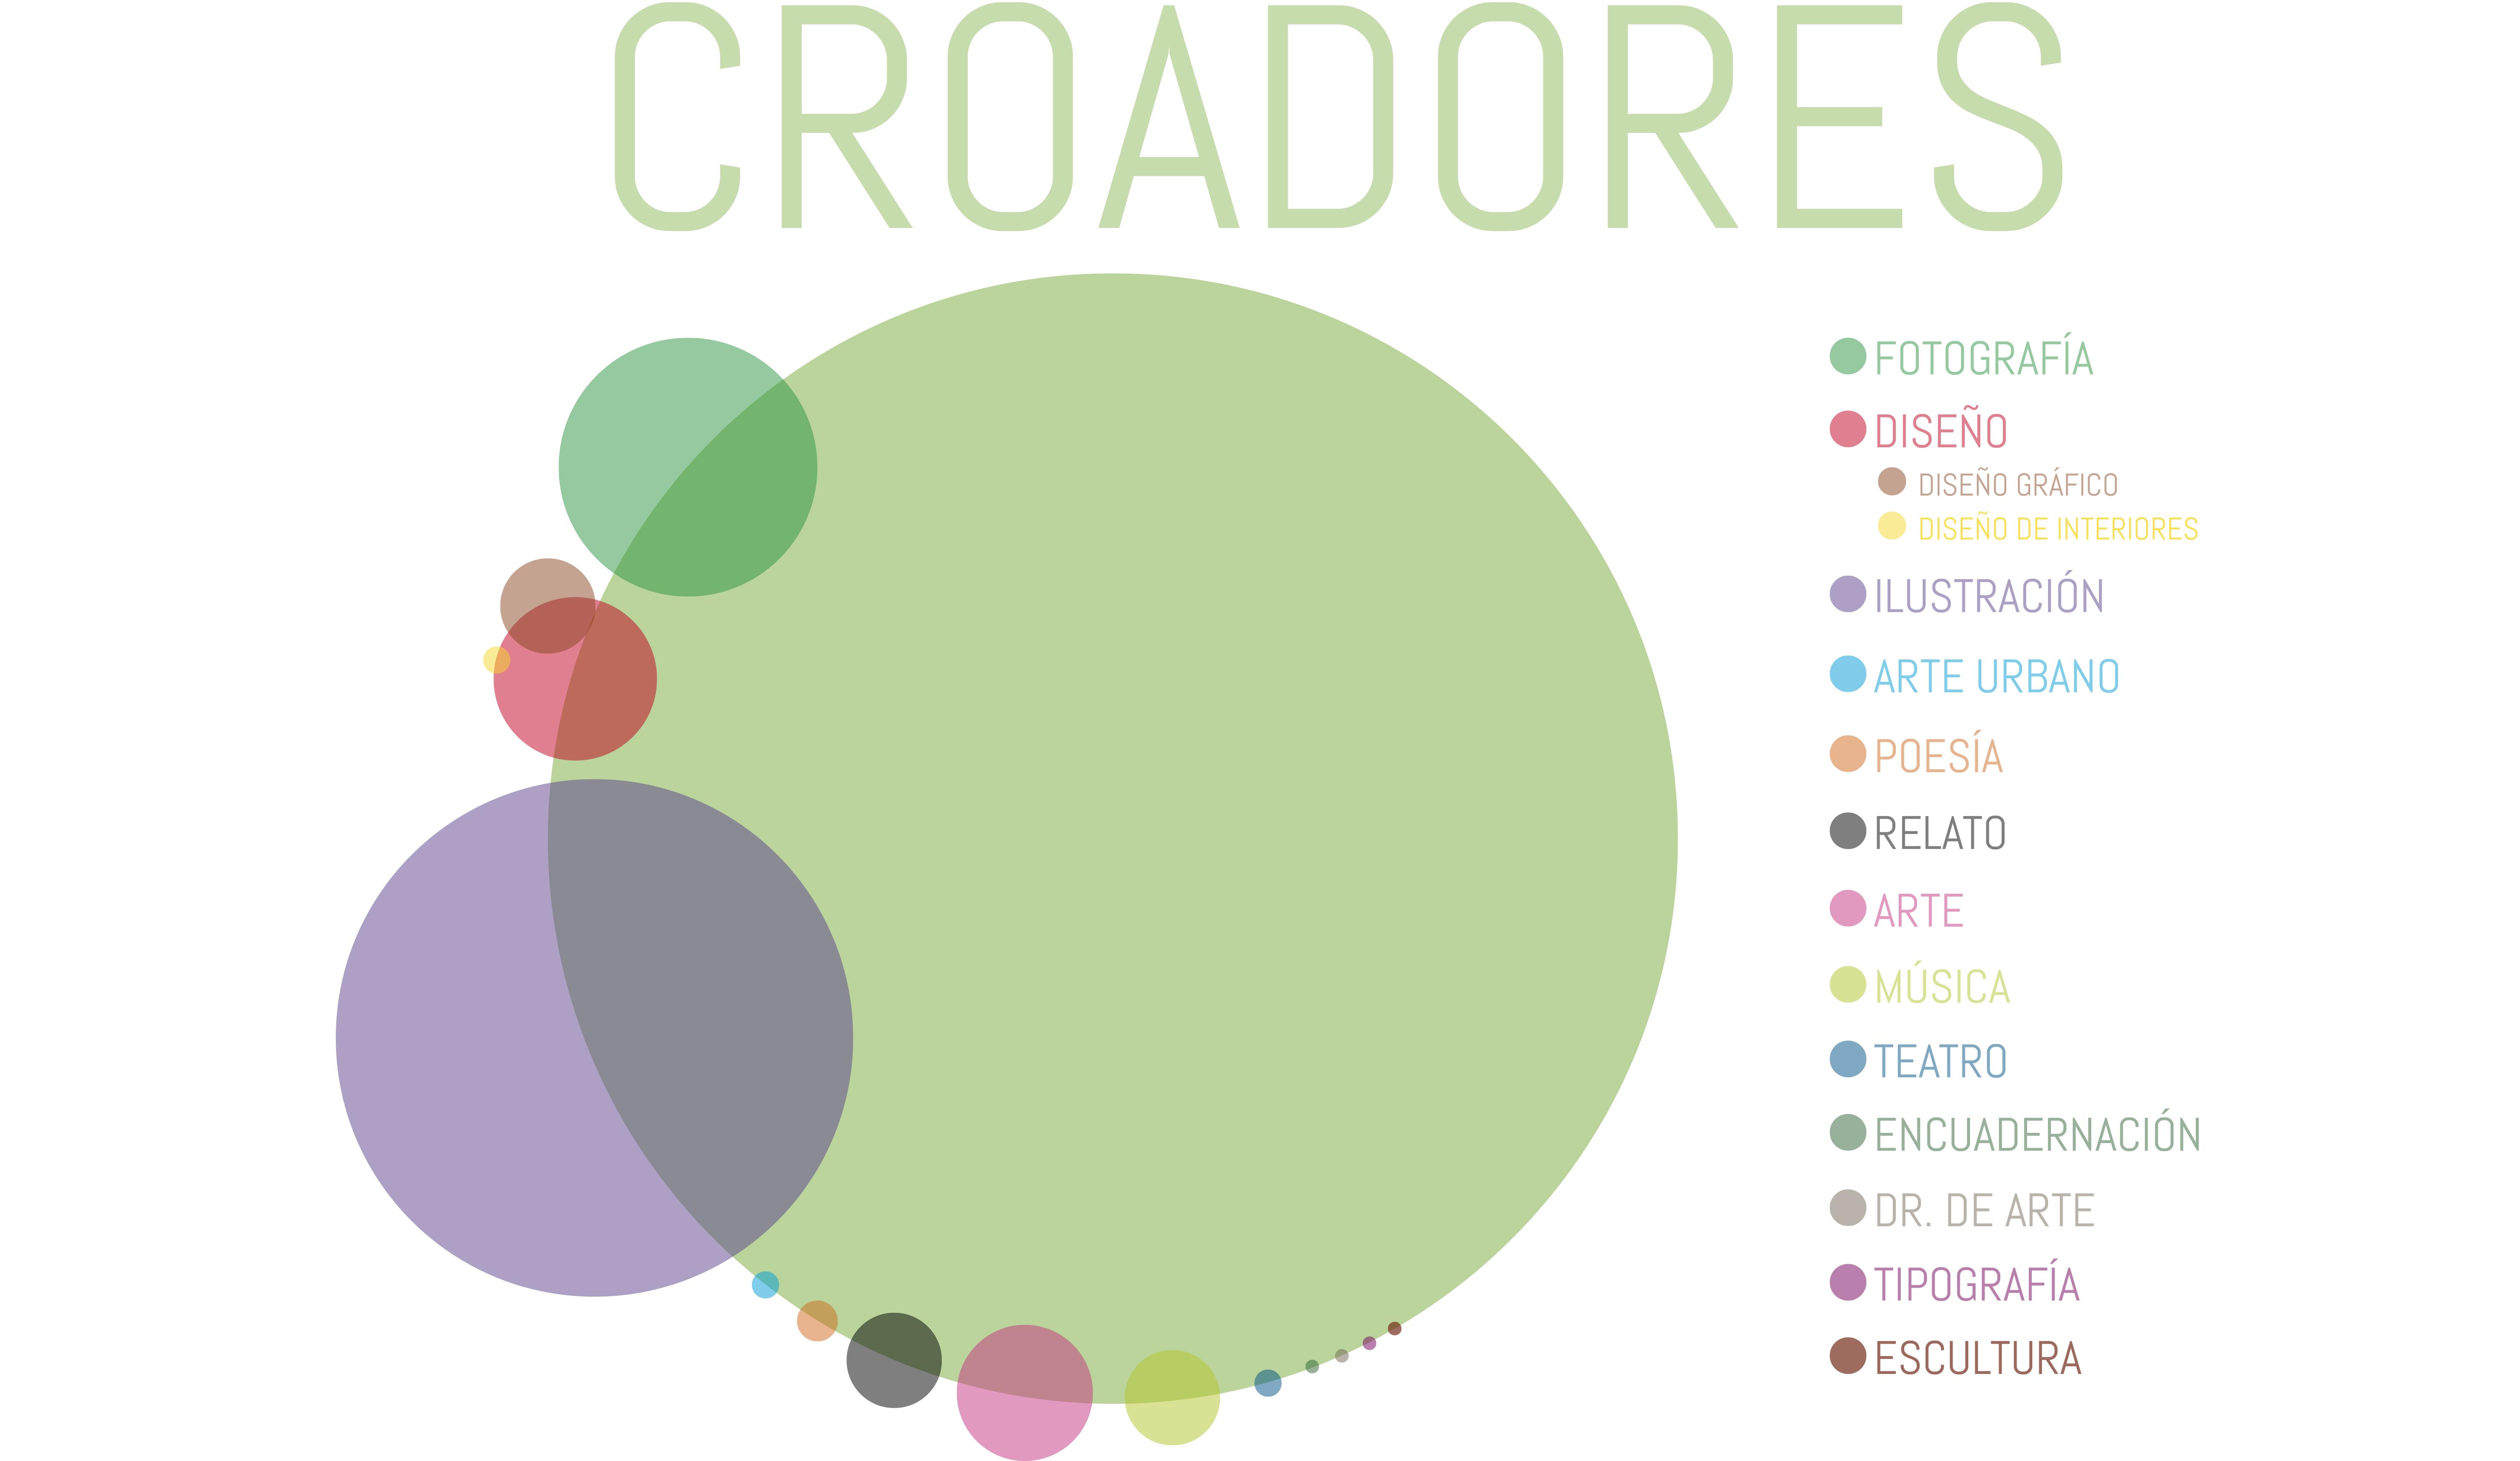 estudio croa2